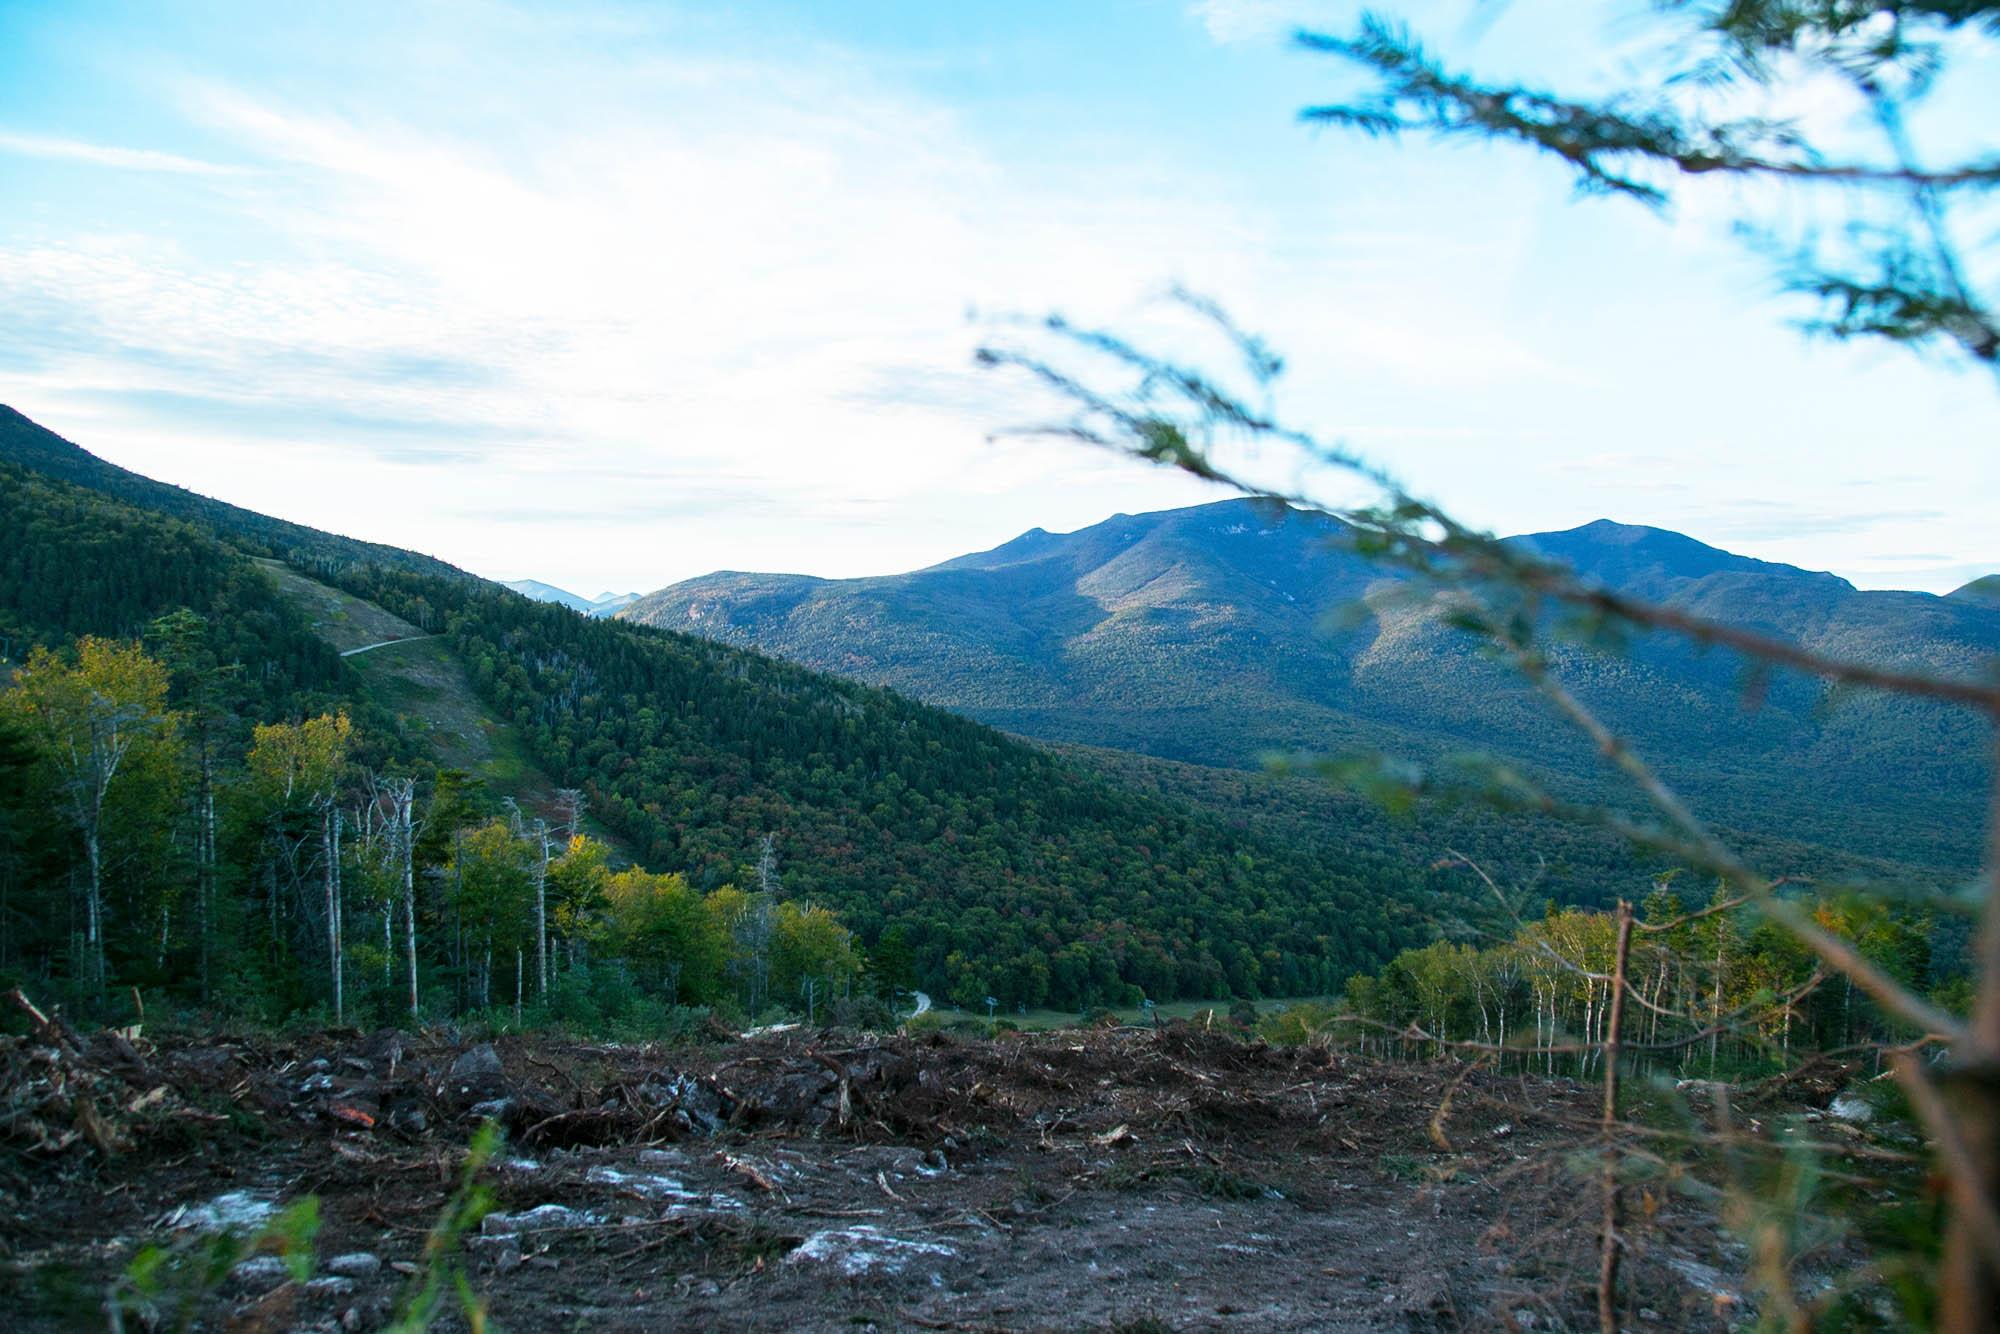 Construction on Green Peak has begun